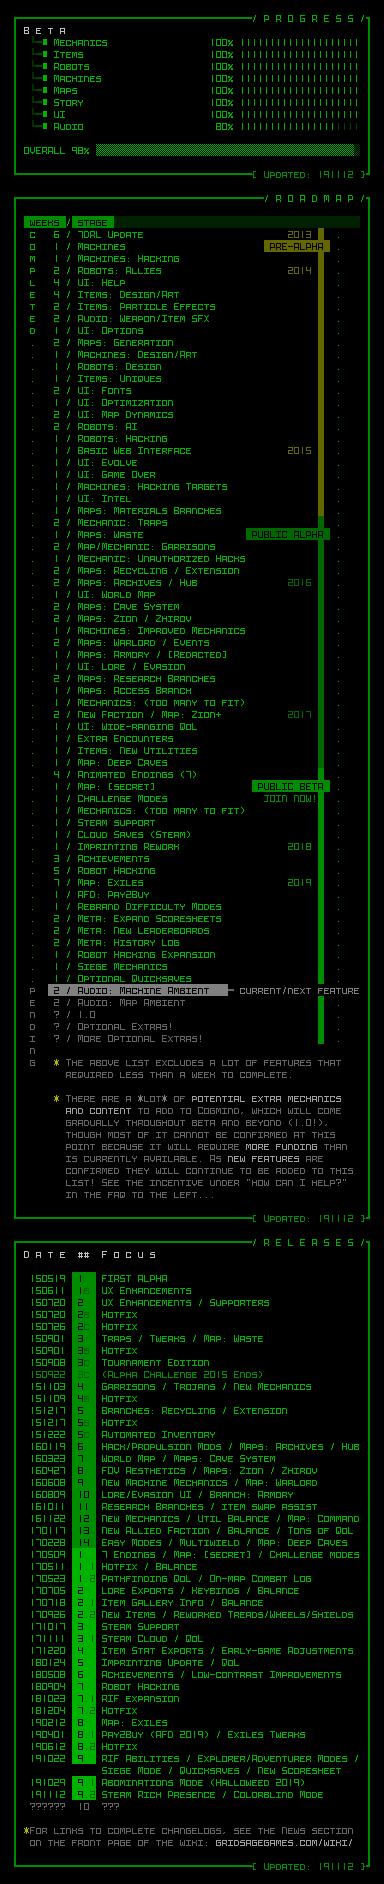 cogmind_dev_roadmap_191112